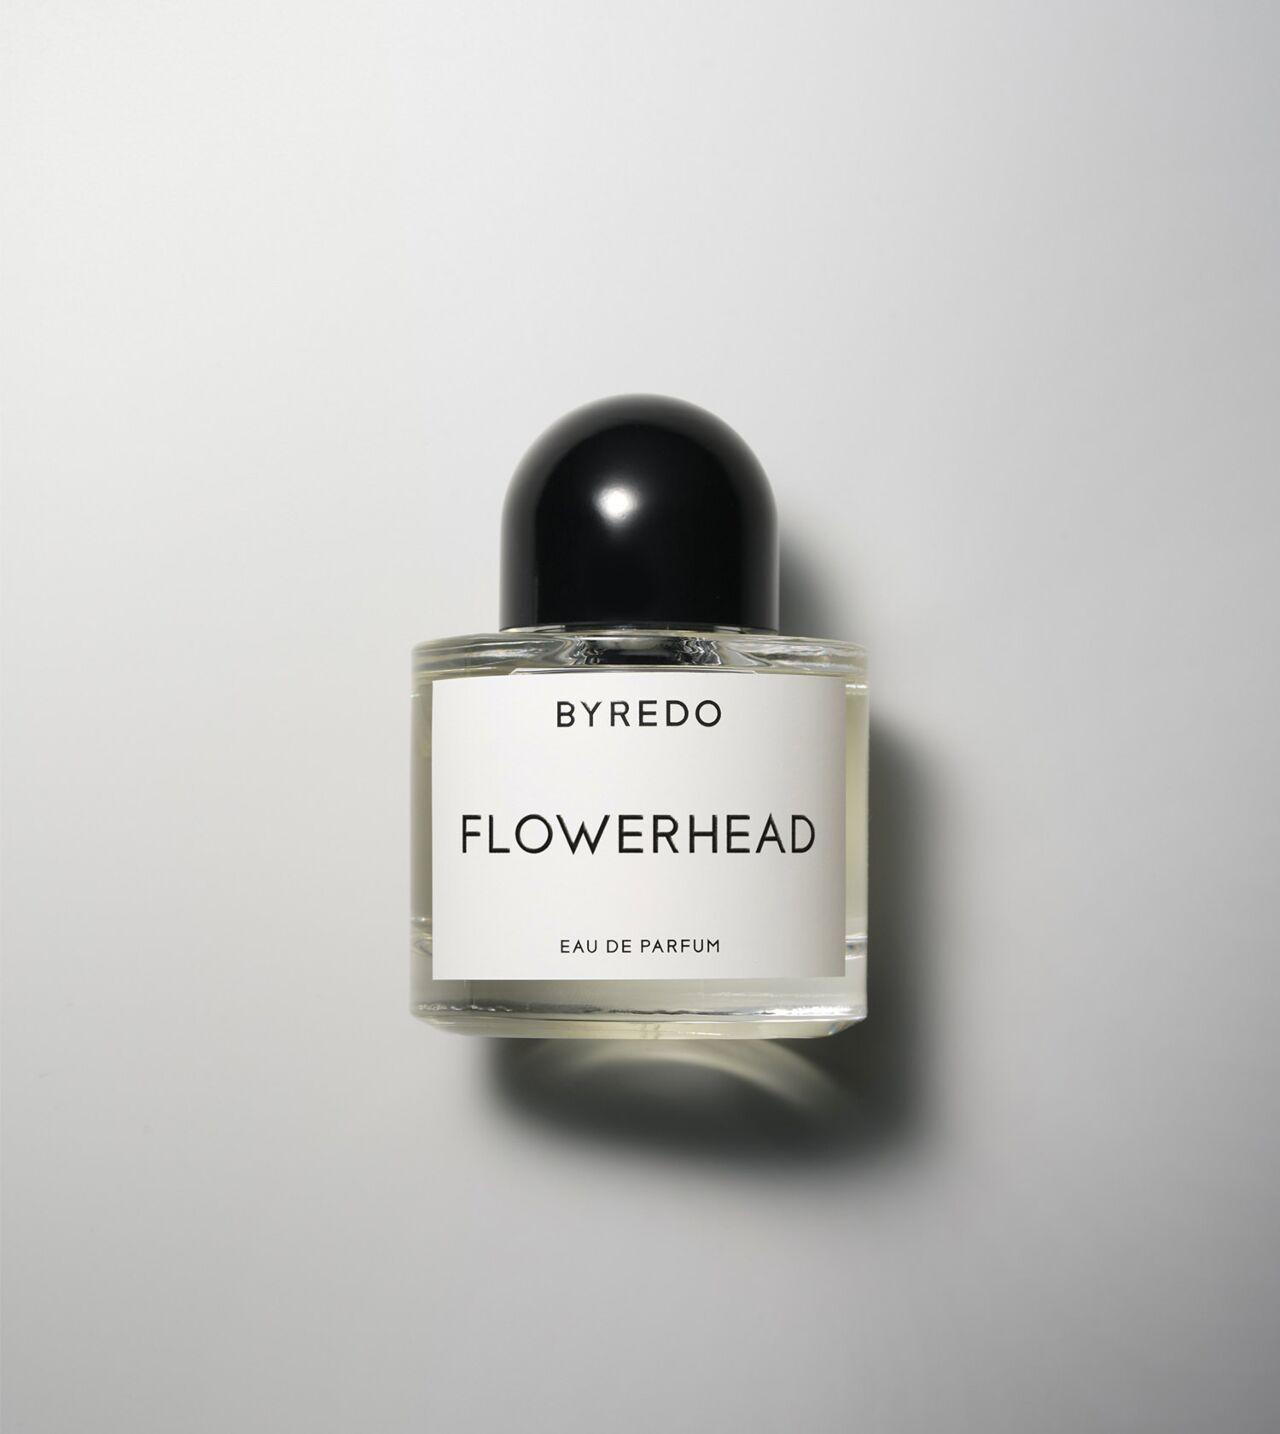 Picture of Byredo Flowerhead Eau de Parfum 50ml